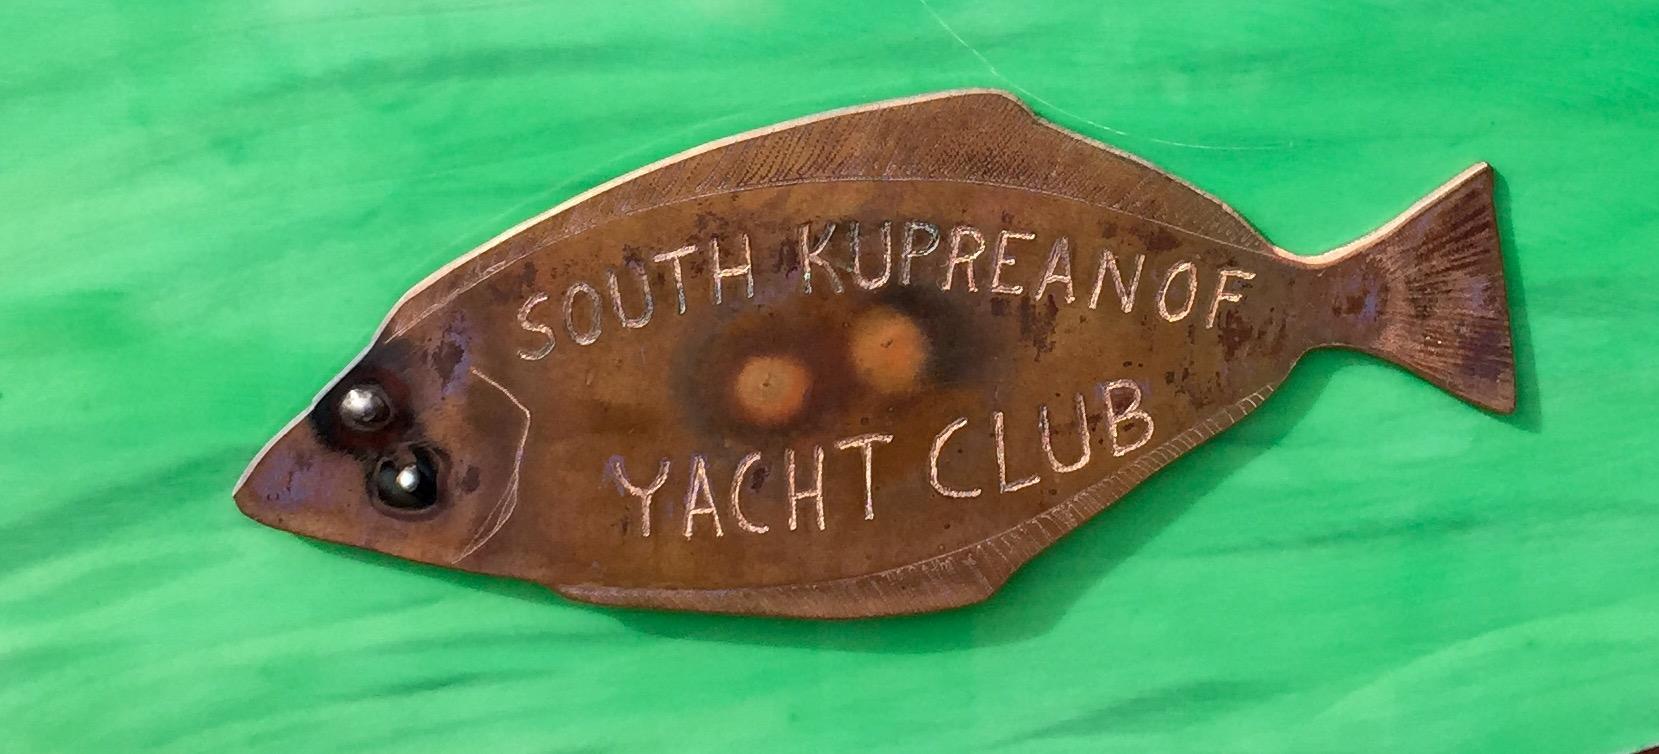 South Kupreanof Yacht Club.jpg